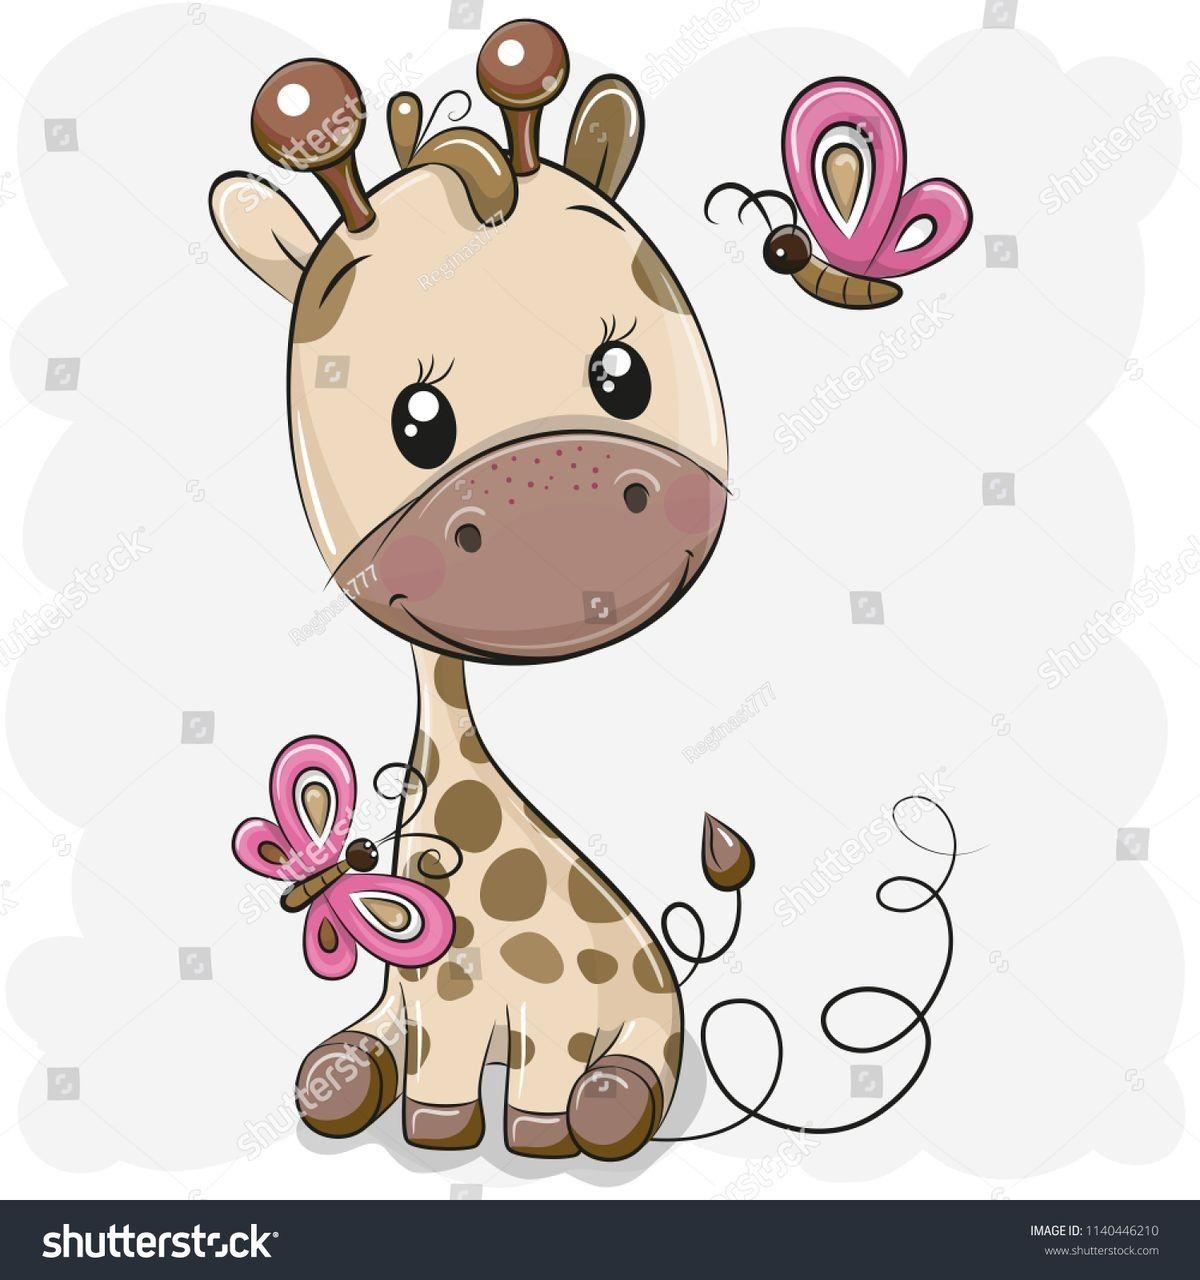 Pin By Myra Calhoun On Anime Drawing Etc Cartoon Giraffe